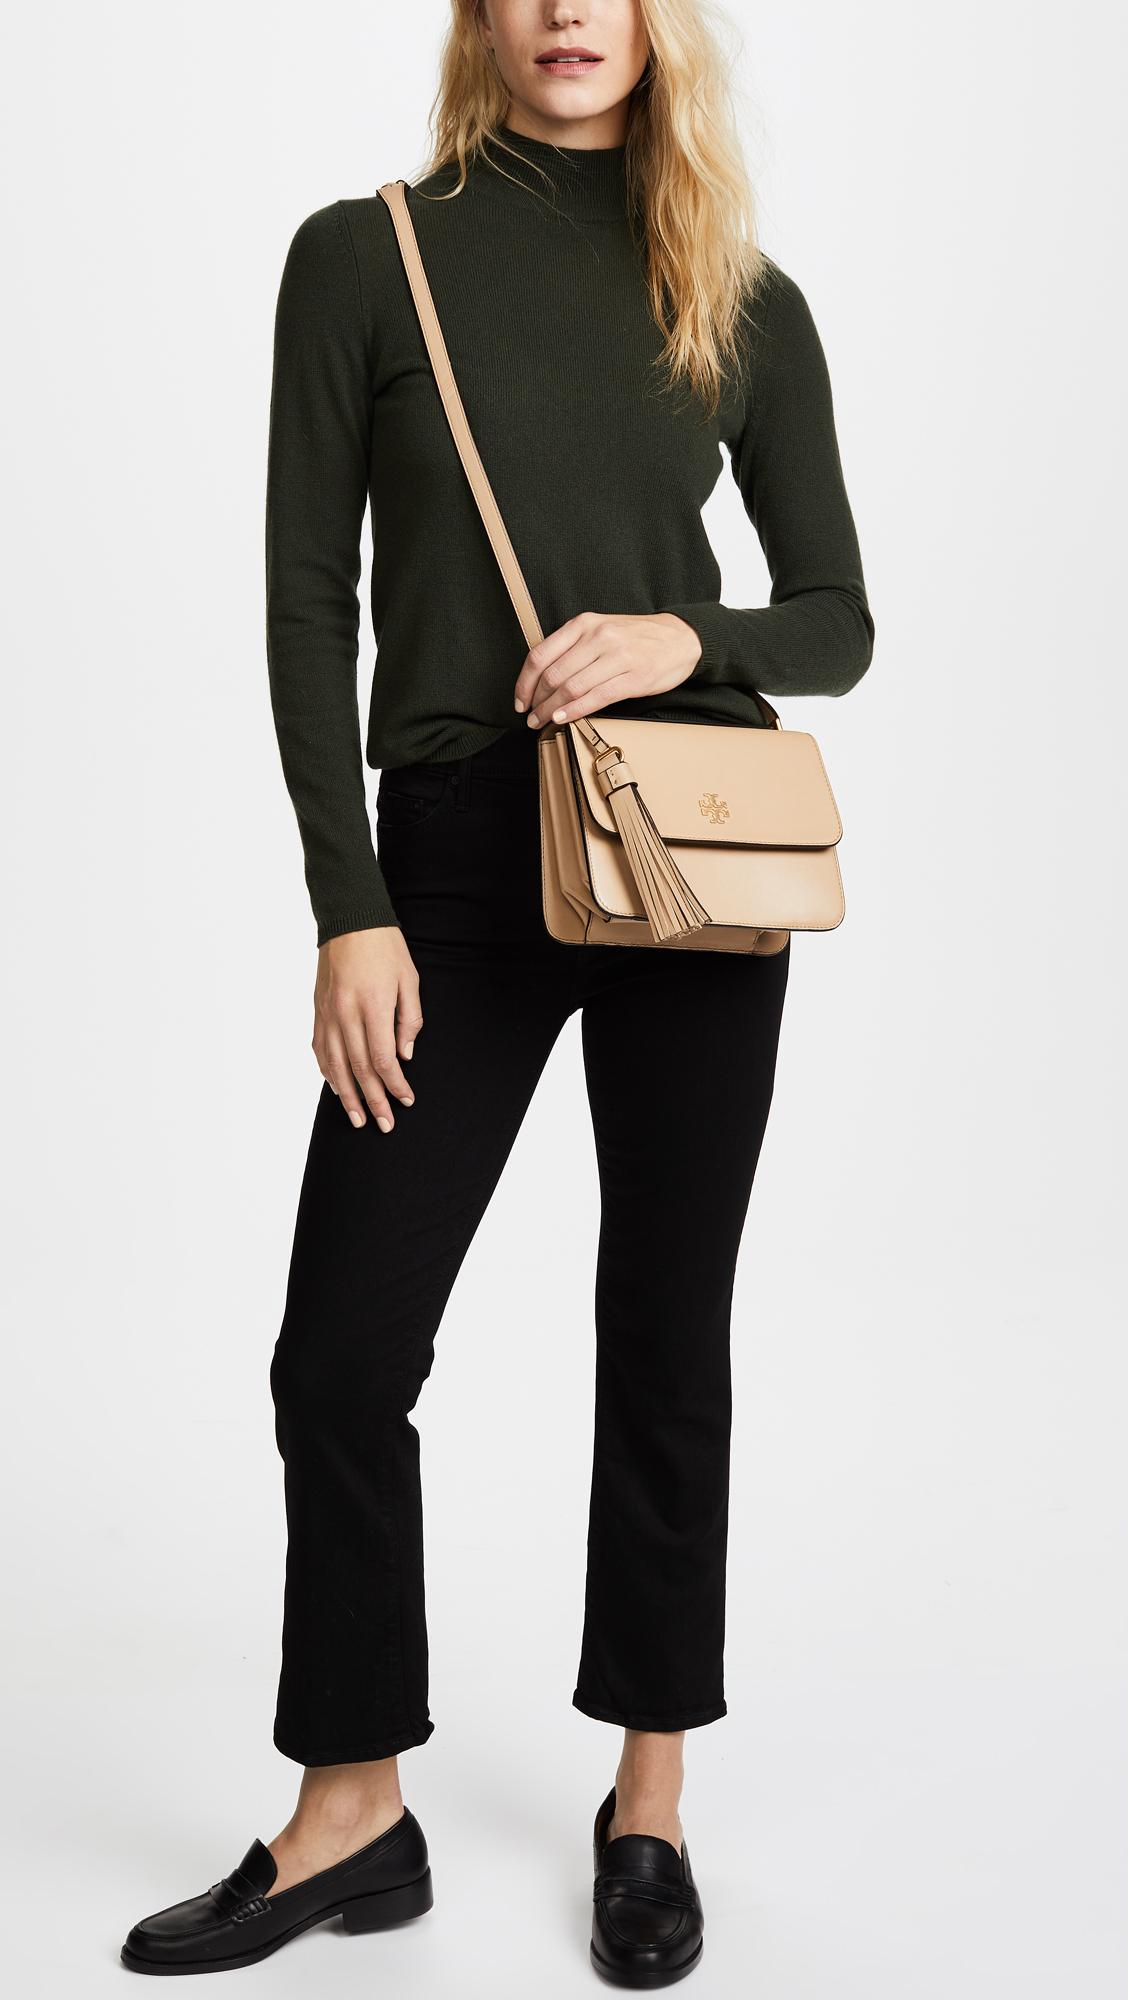 dbf73cf5e1a18 Tory Burch Brooke Shoulder Bag